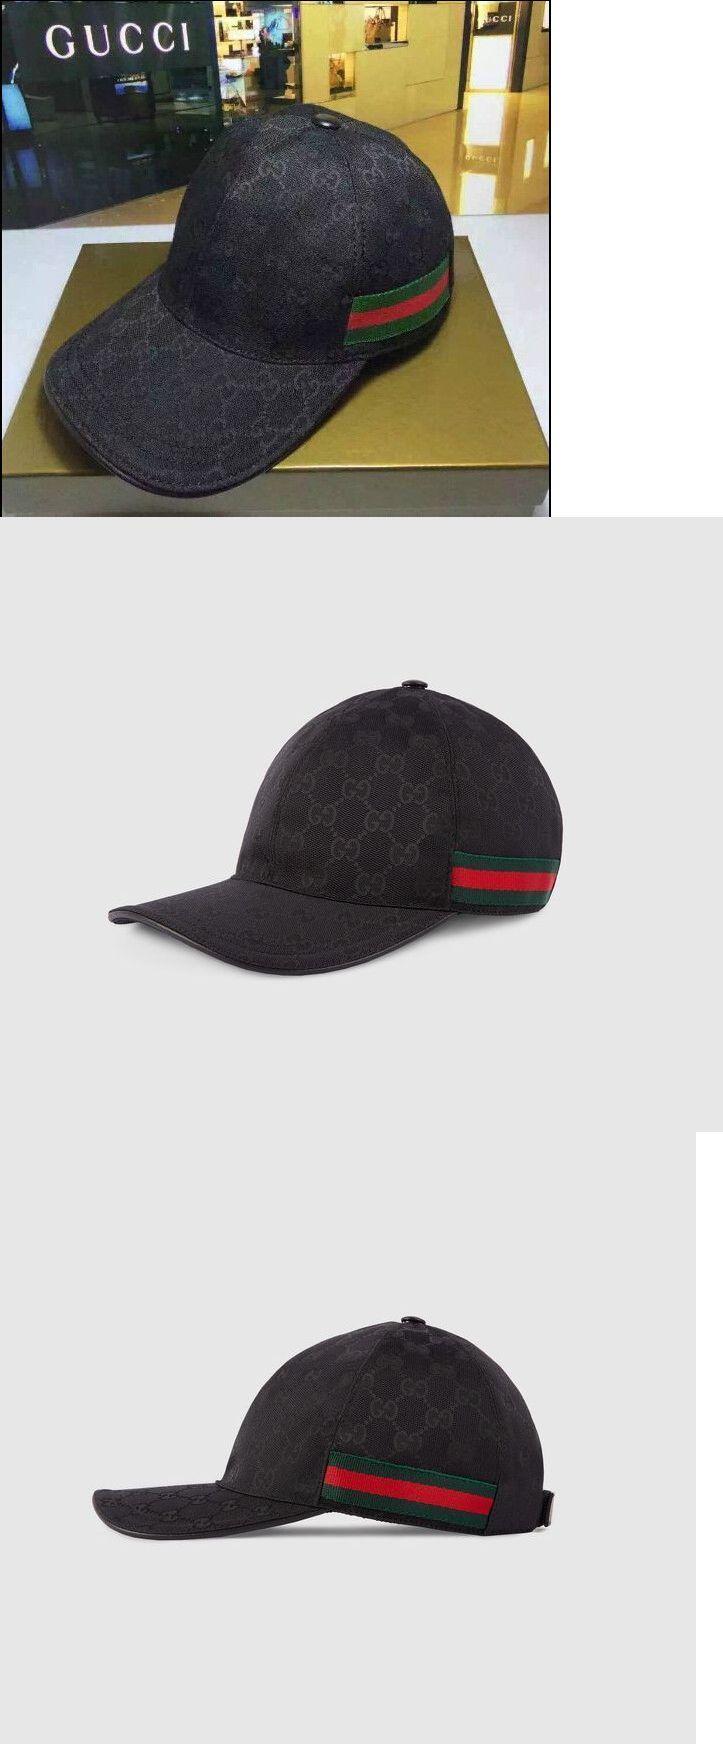 0539b2e0f5748 Hats 52365  Gucci Hat Black